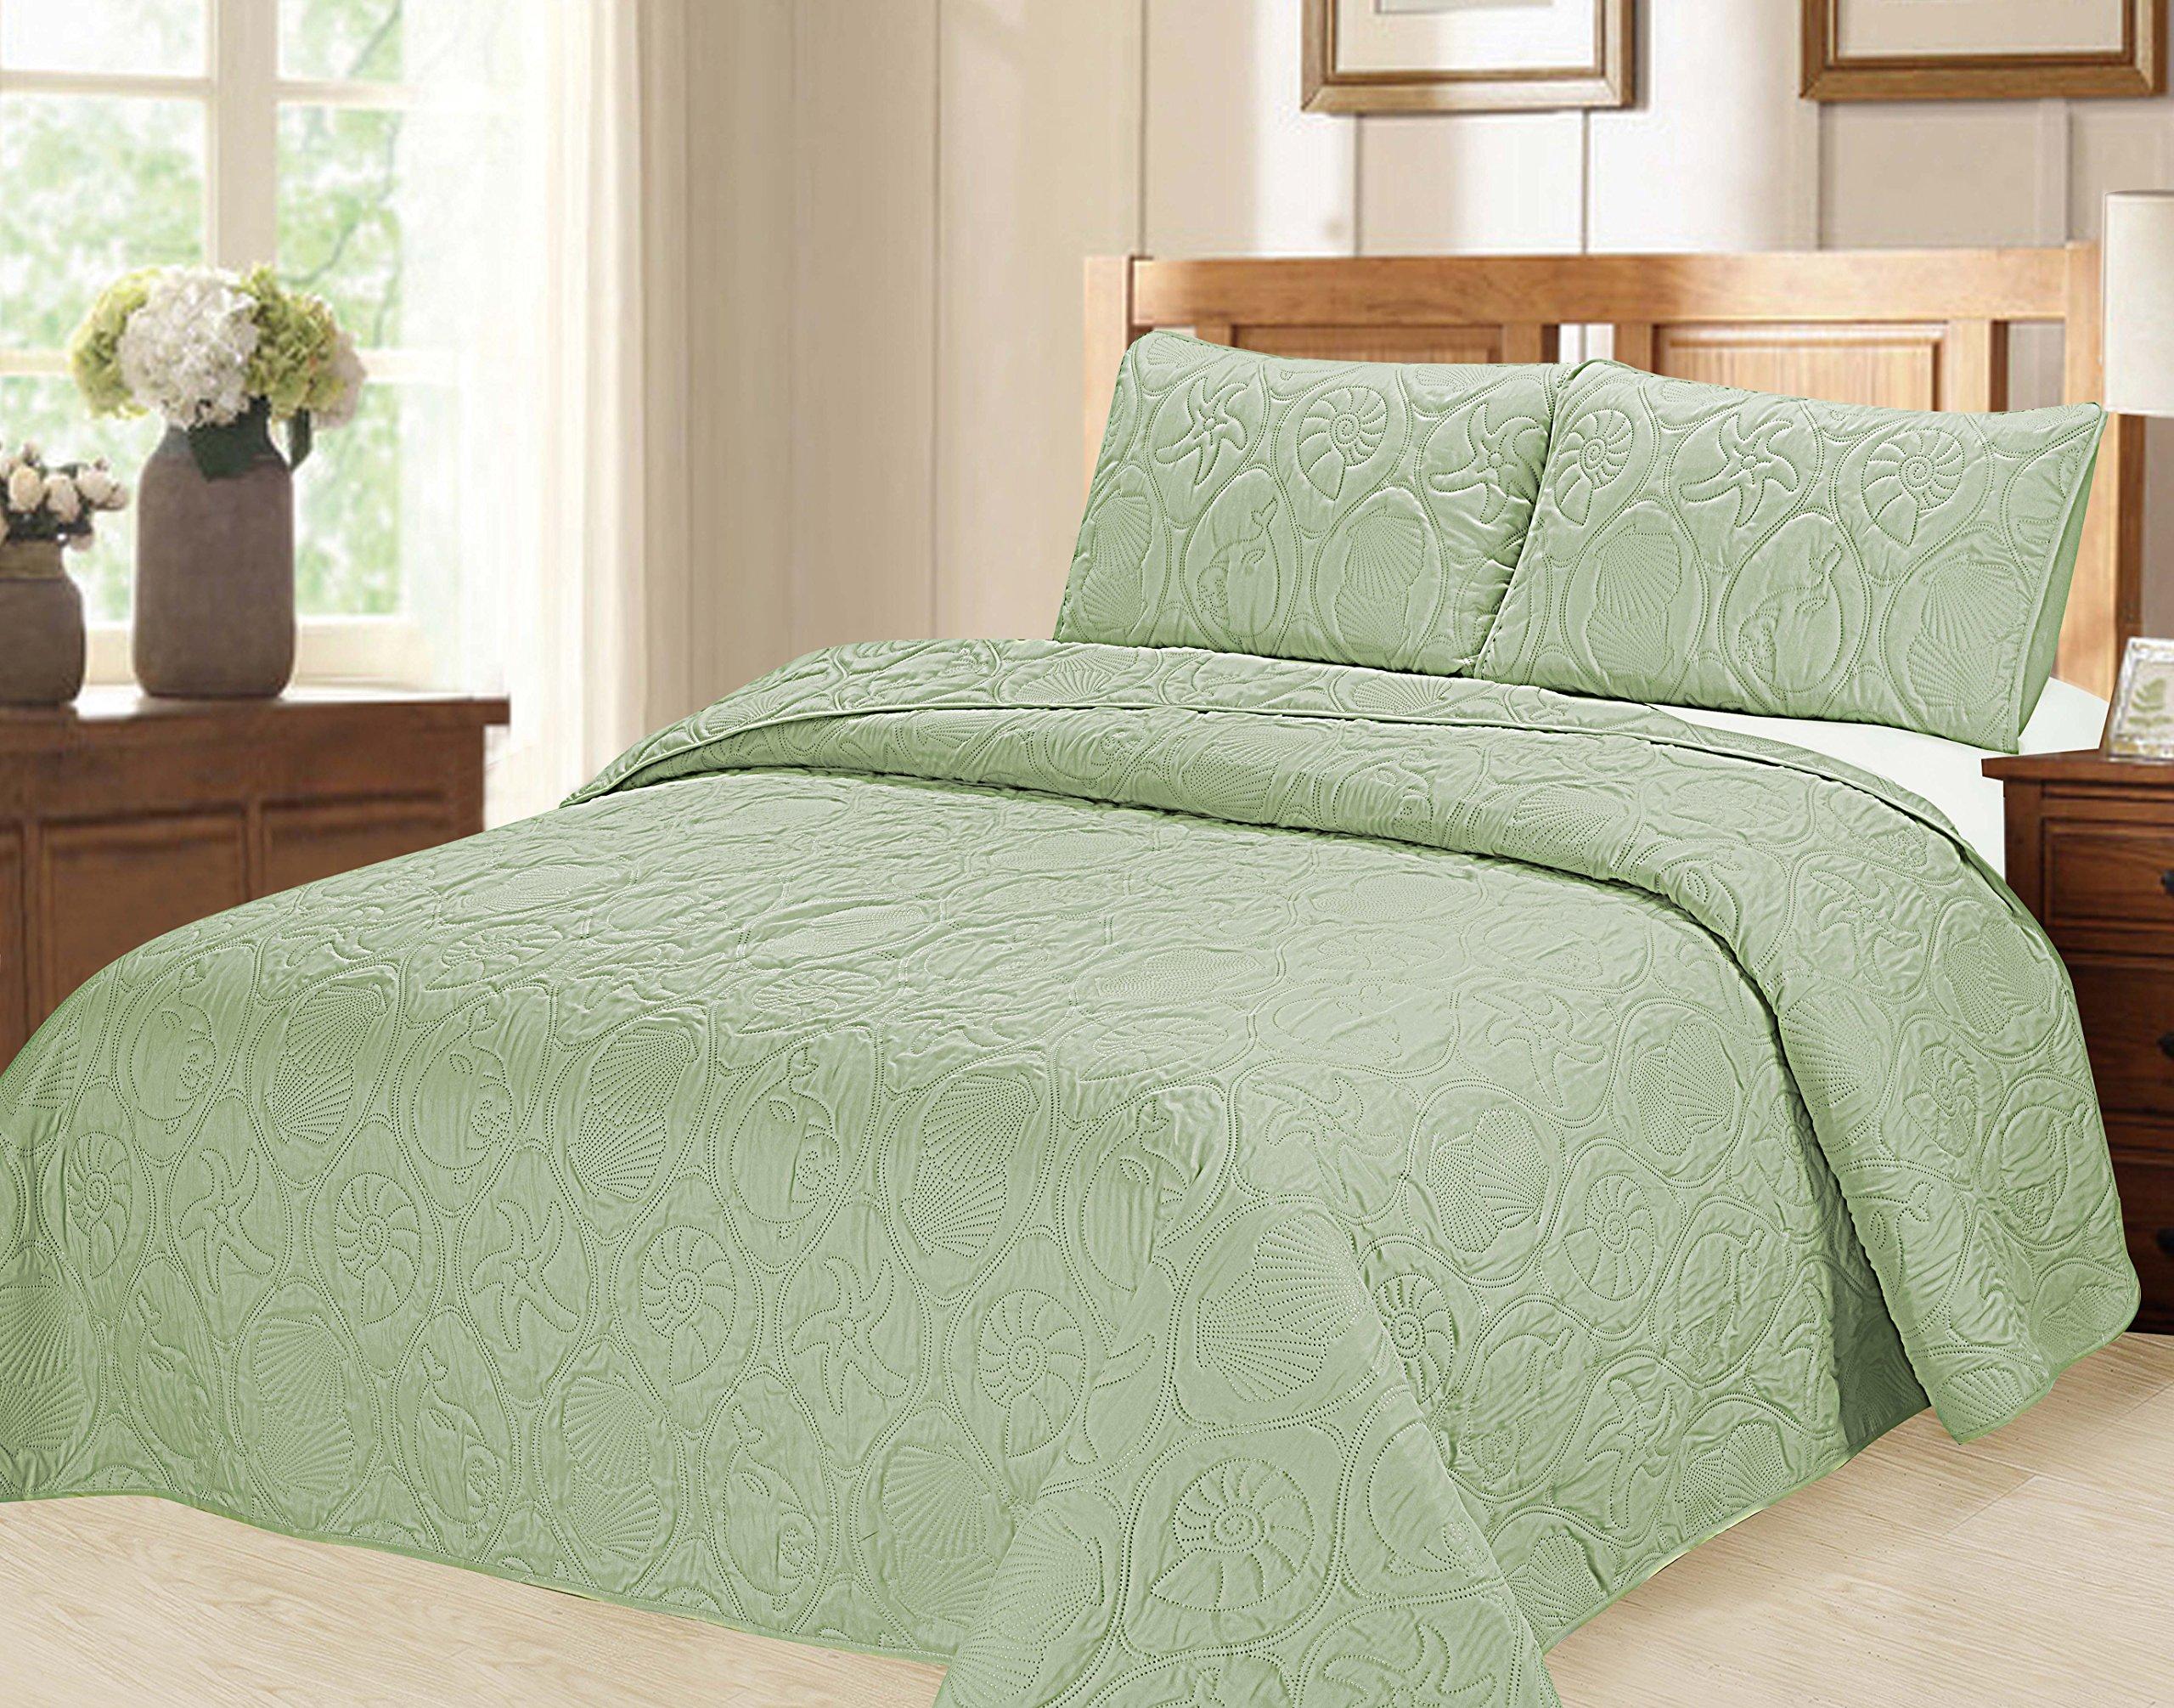 Verno Ocean Star Oversized Bedspread Set with Shams (Sage, Full)